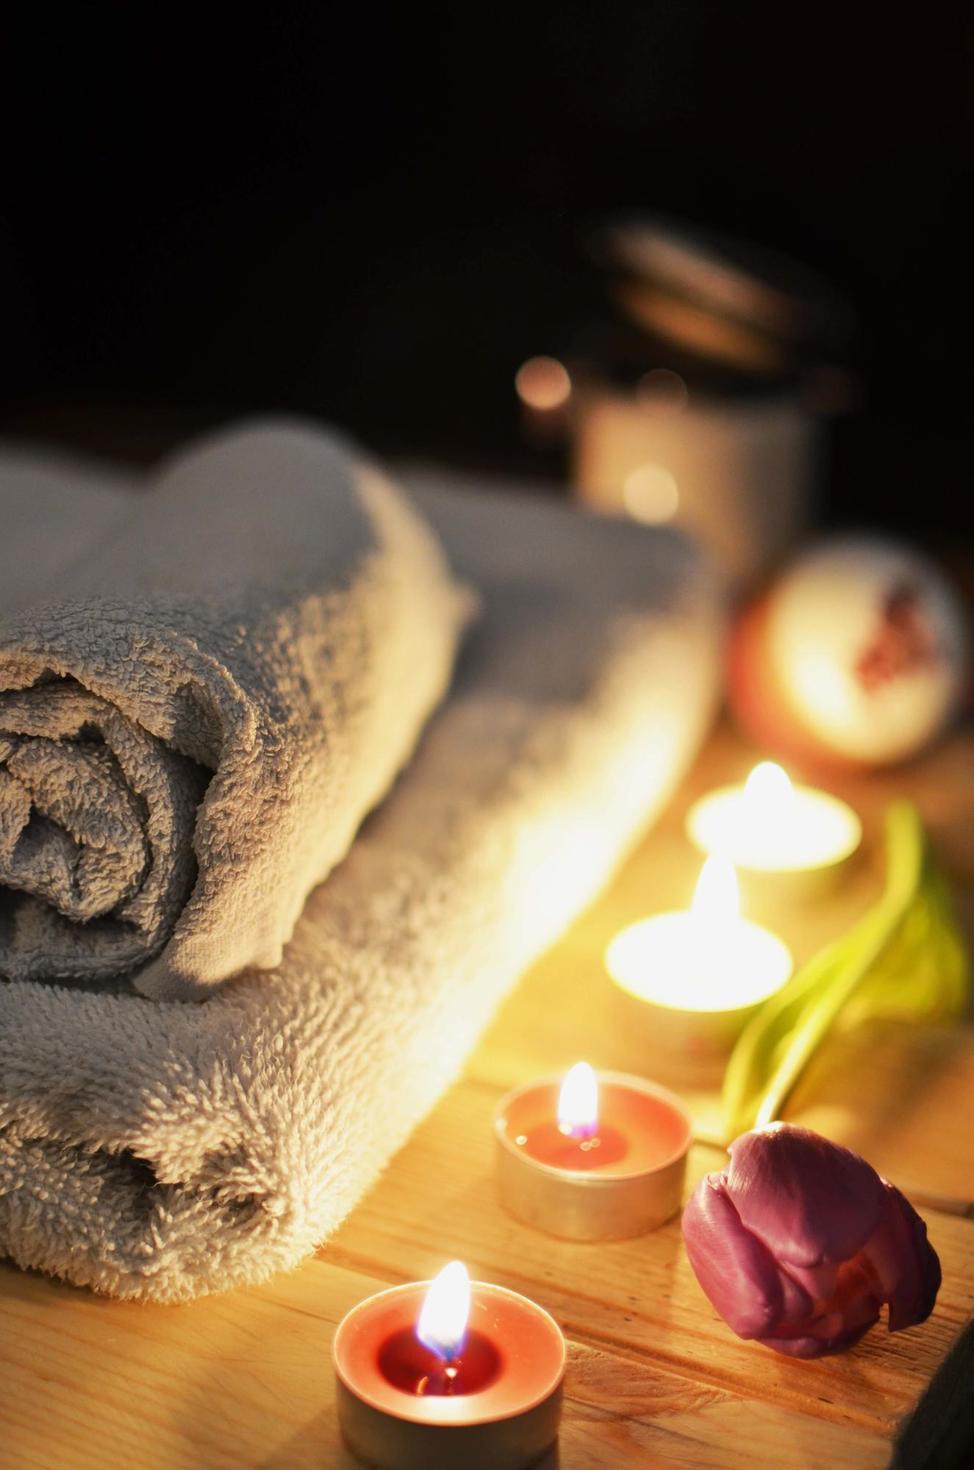 Essential Oils for Baths 101: A Celebrity Dermatologist Weighs In